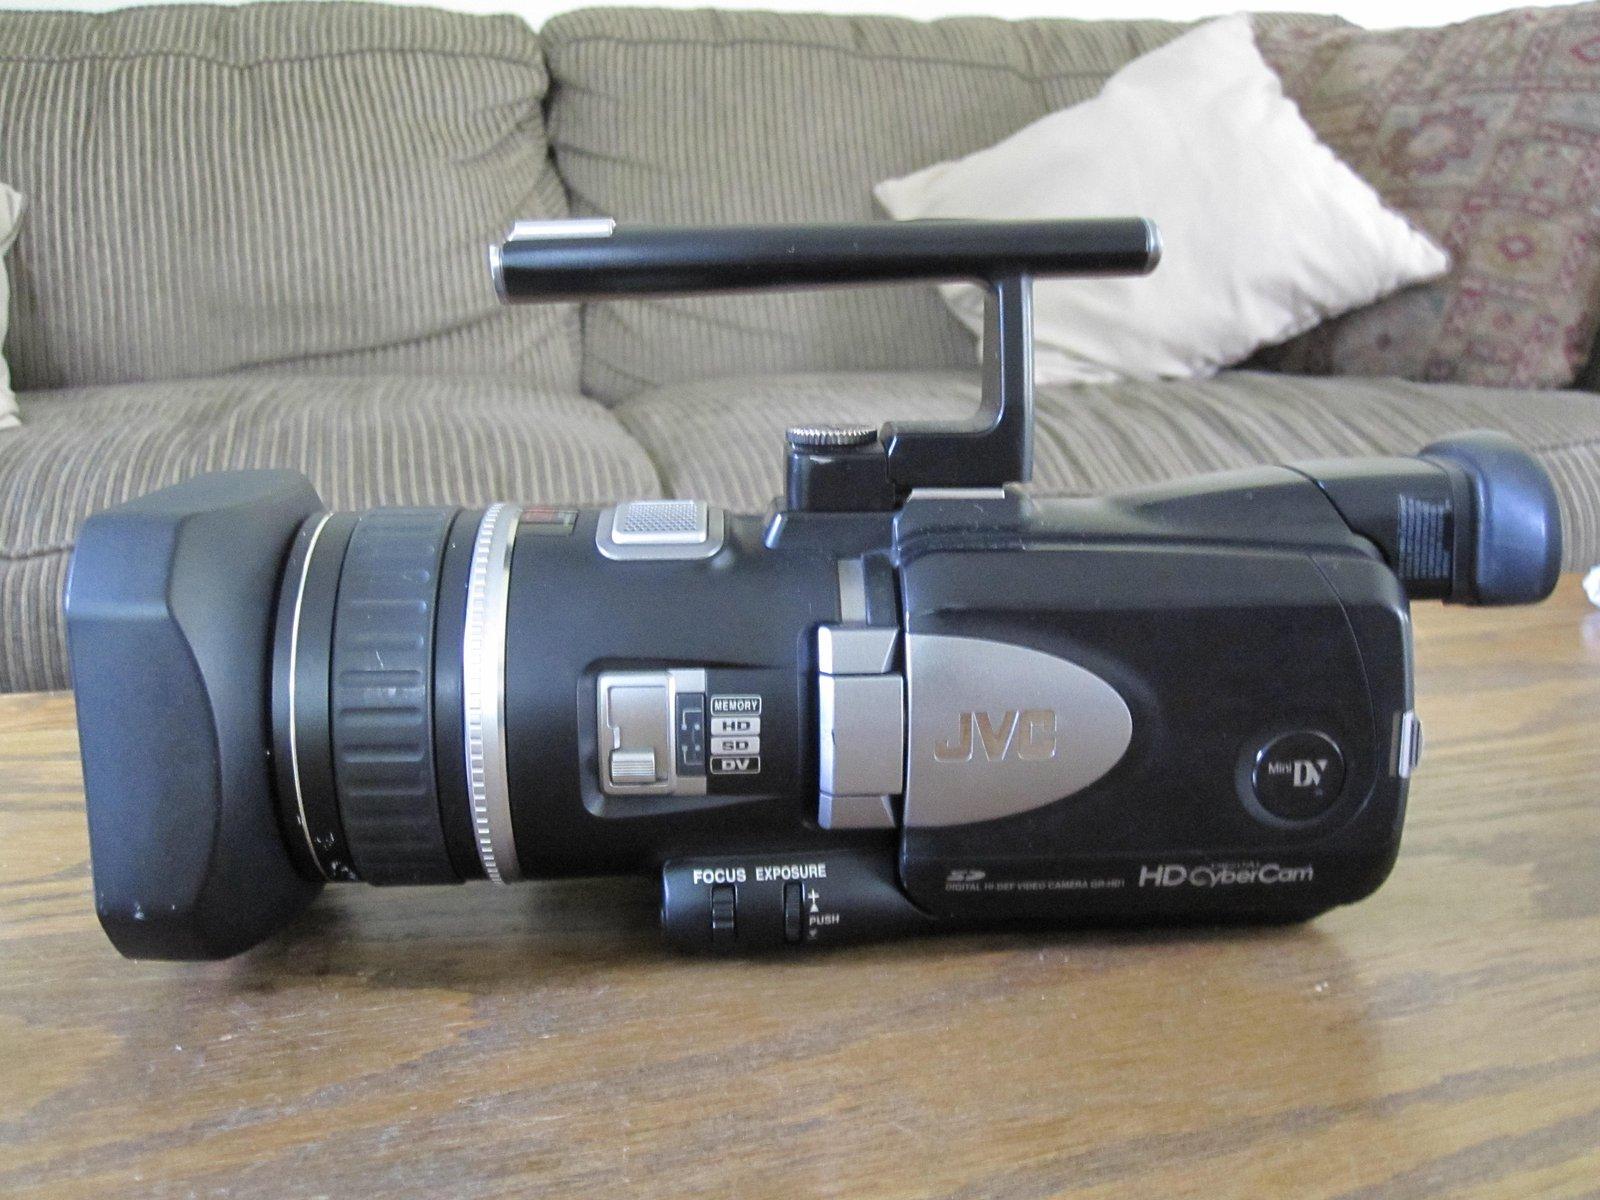 #1 camera